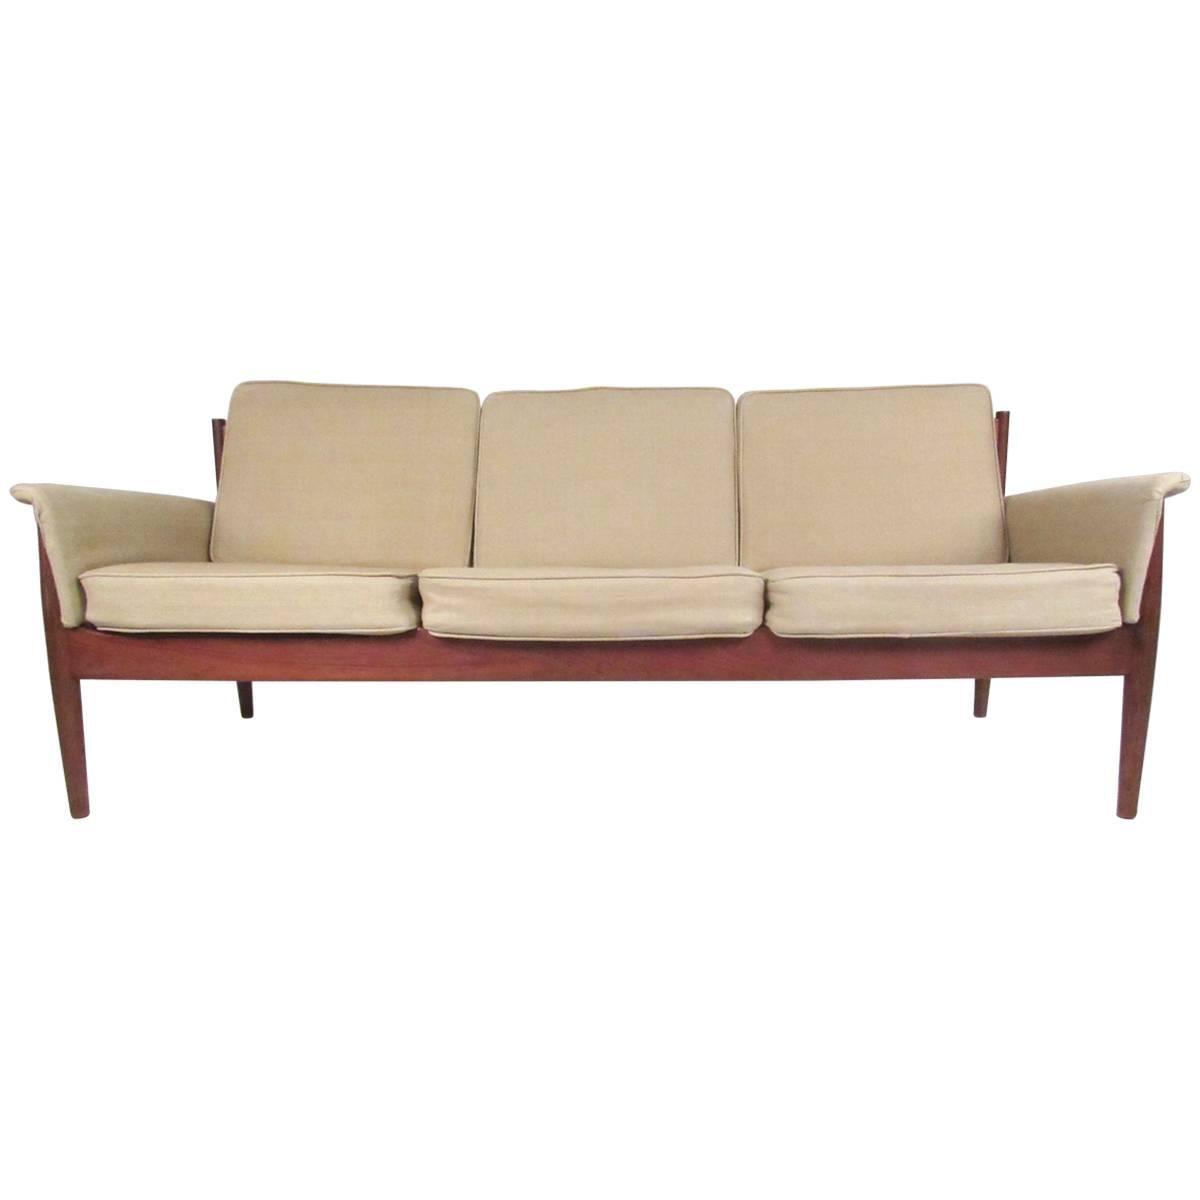 Scandinavian Modern Teak Sofa by Grete Jalk